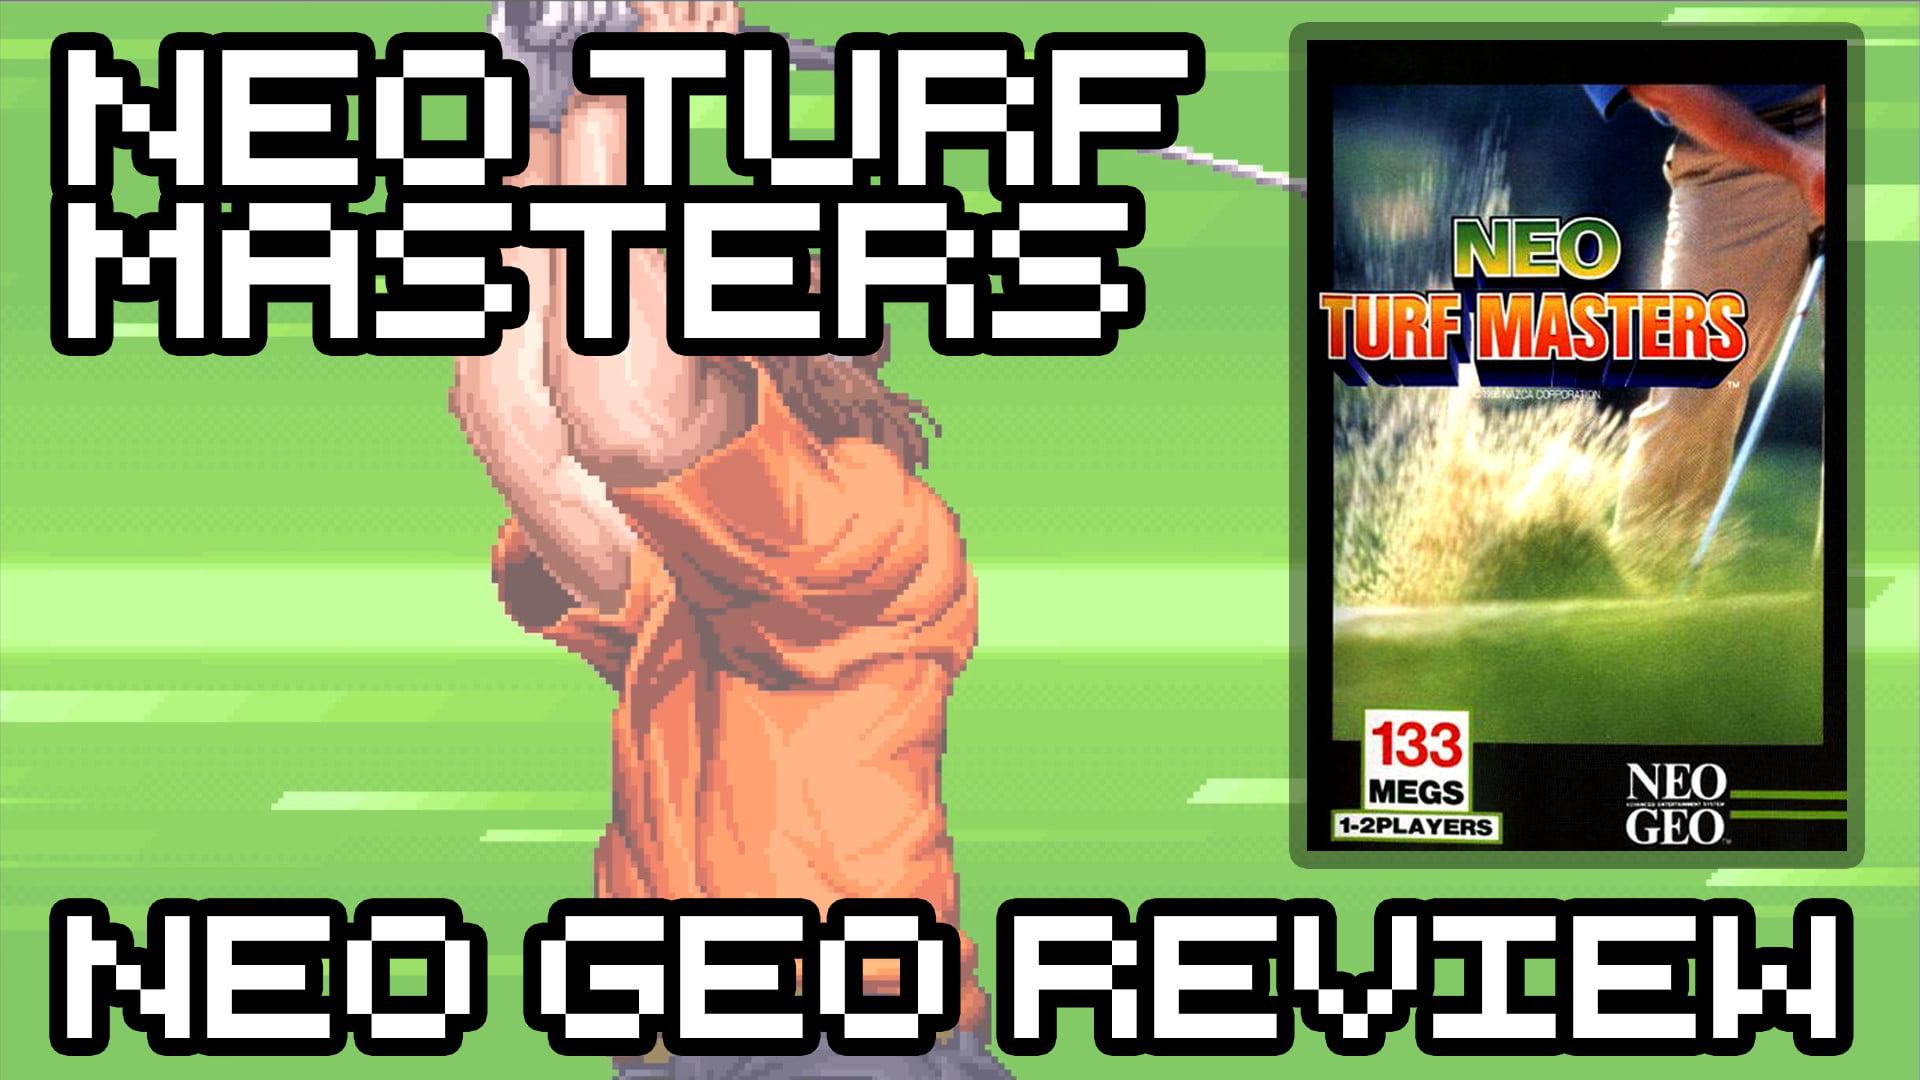 Neo Turf Masters – Neo Geo Review